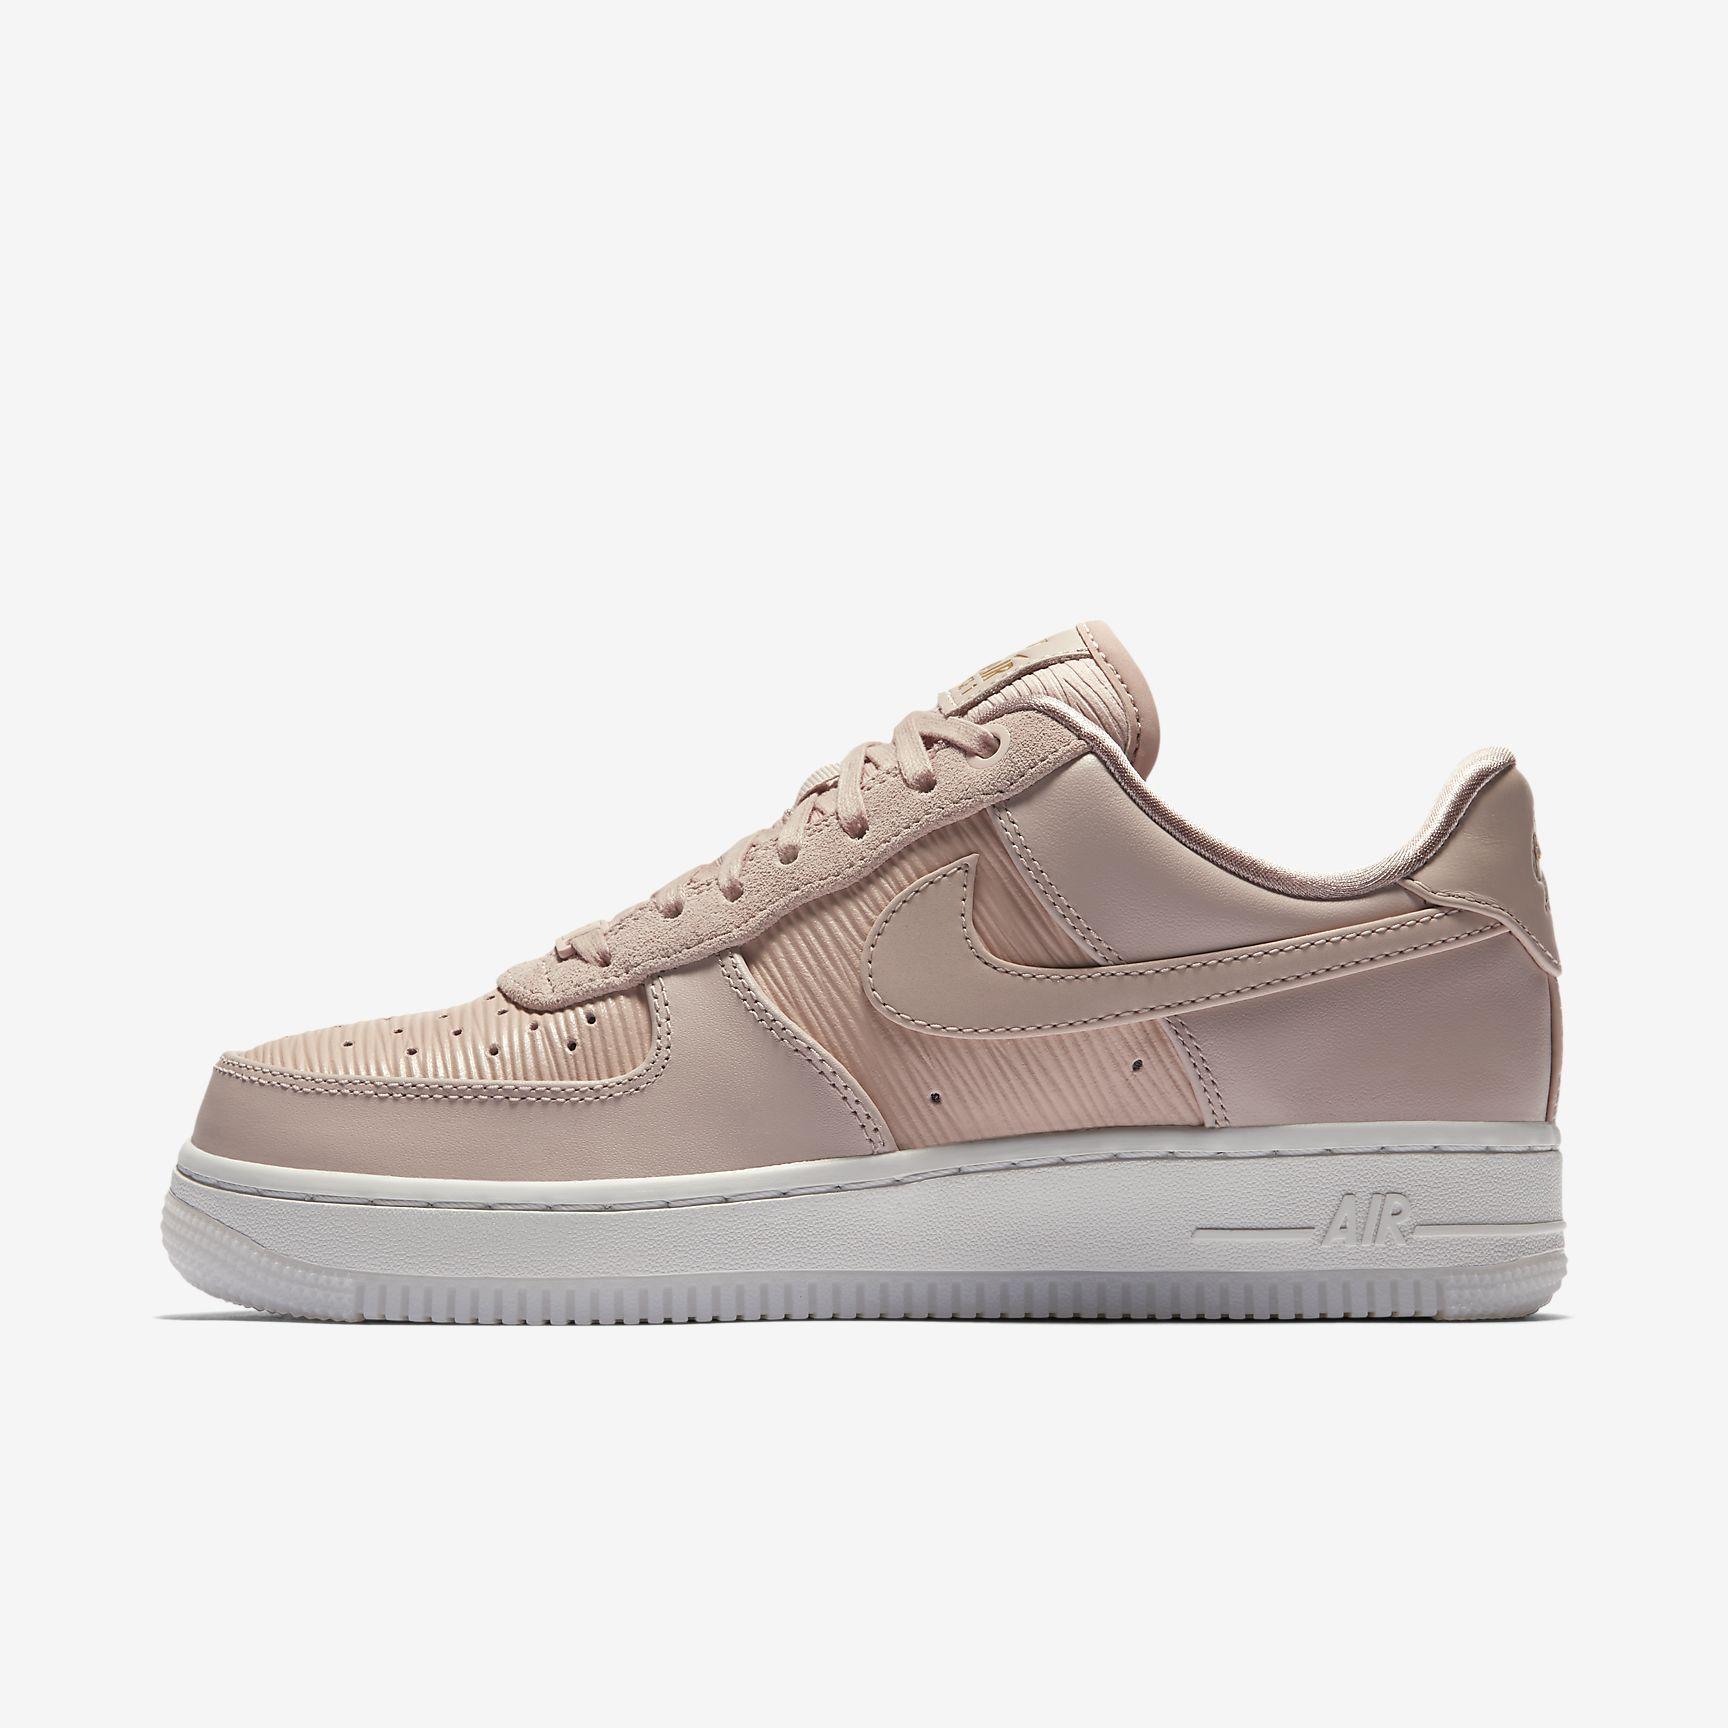 cc351bf3834af Nike Air Force 1 07 LX